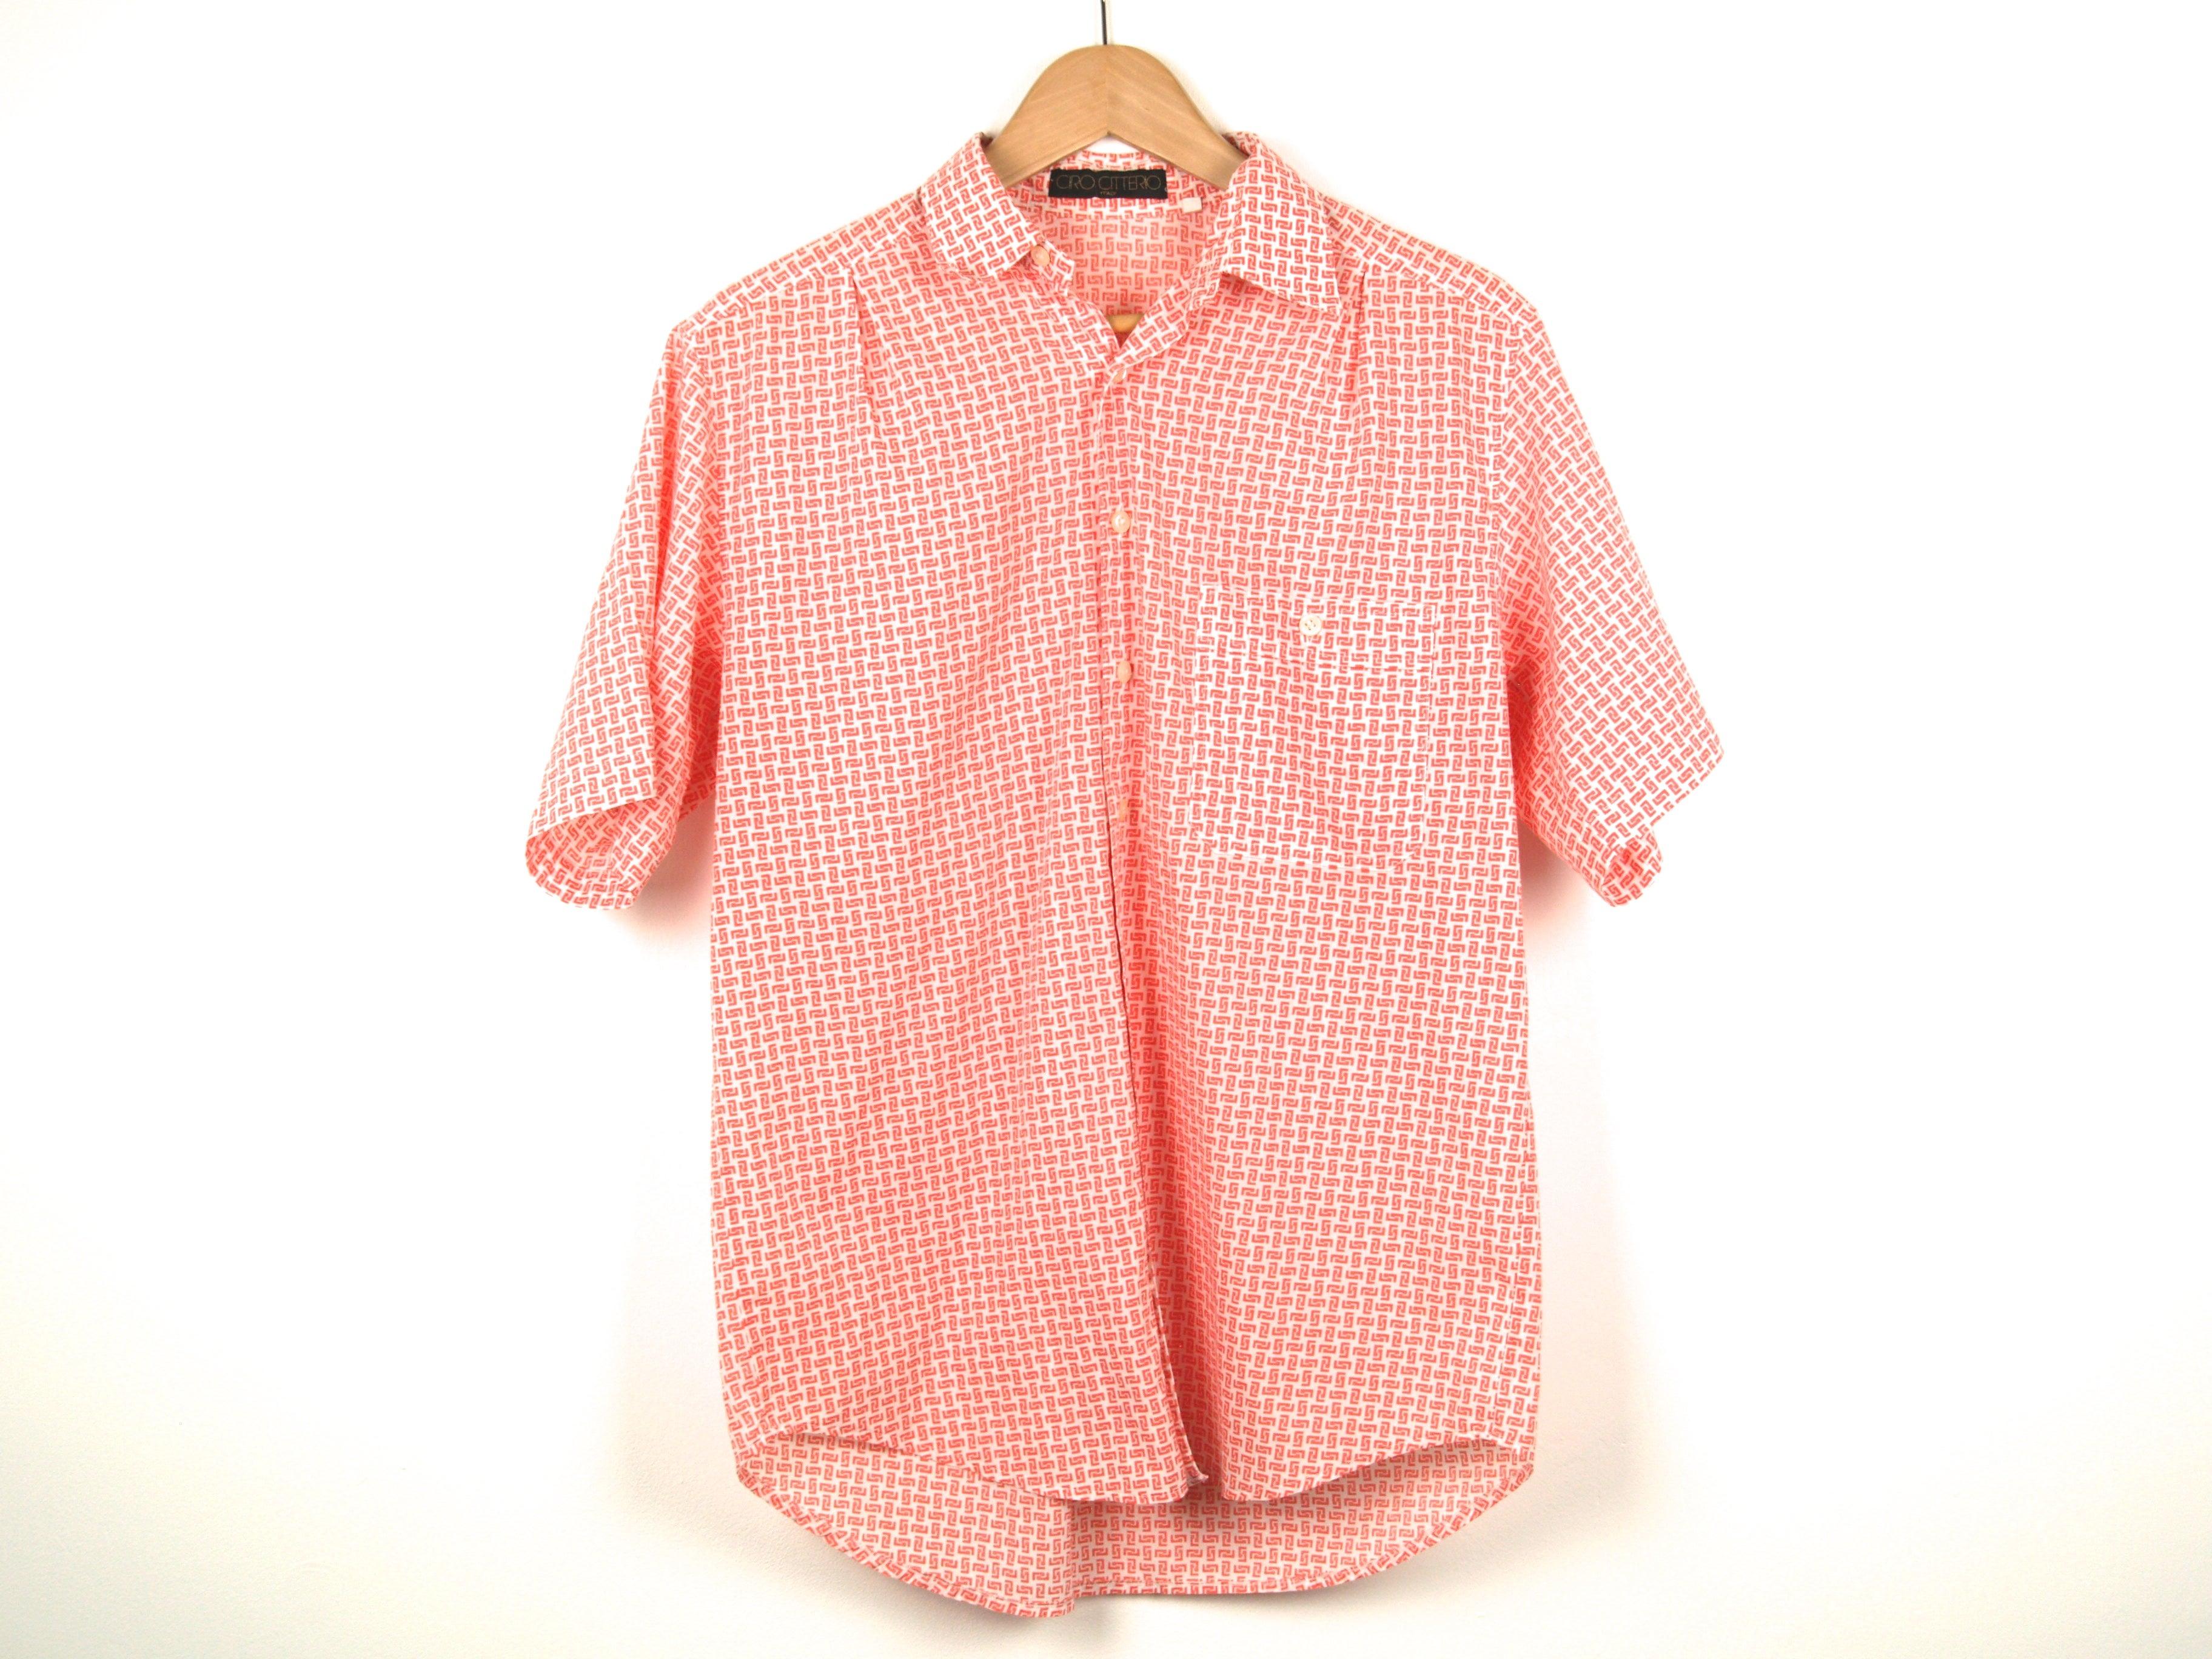 ciro citterio sleeve vintage clothing revival